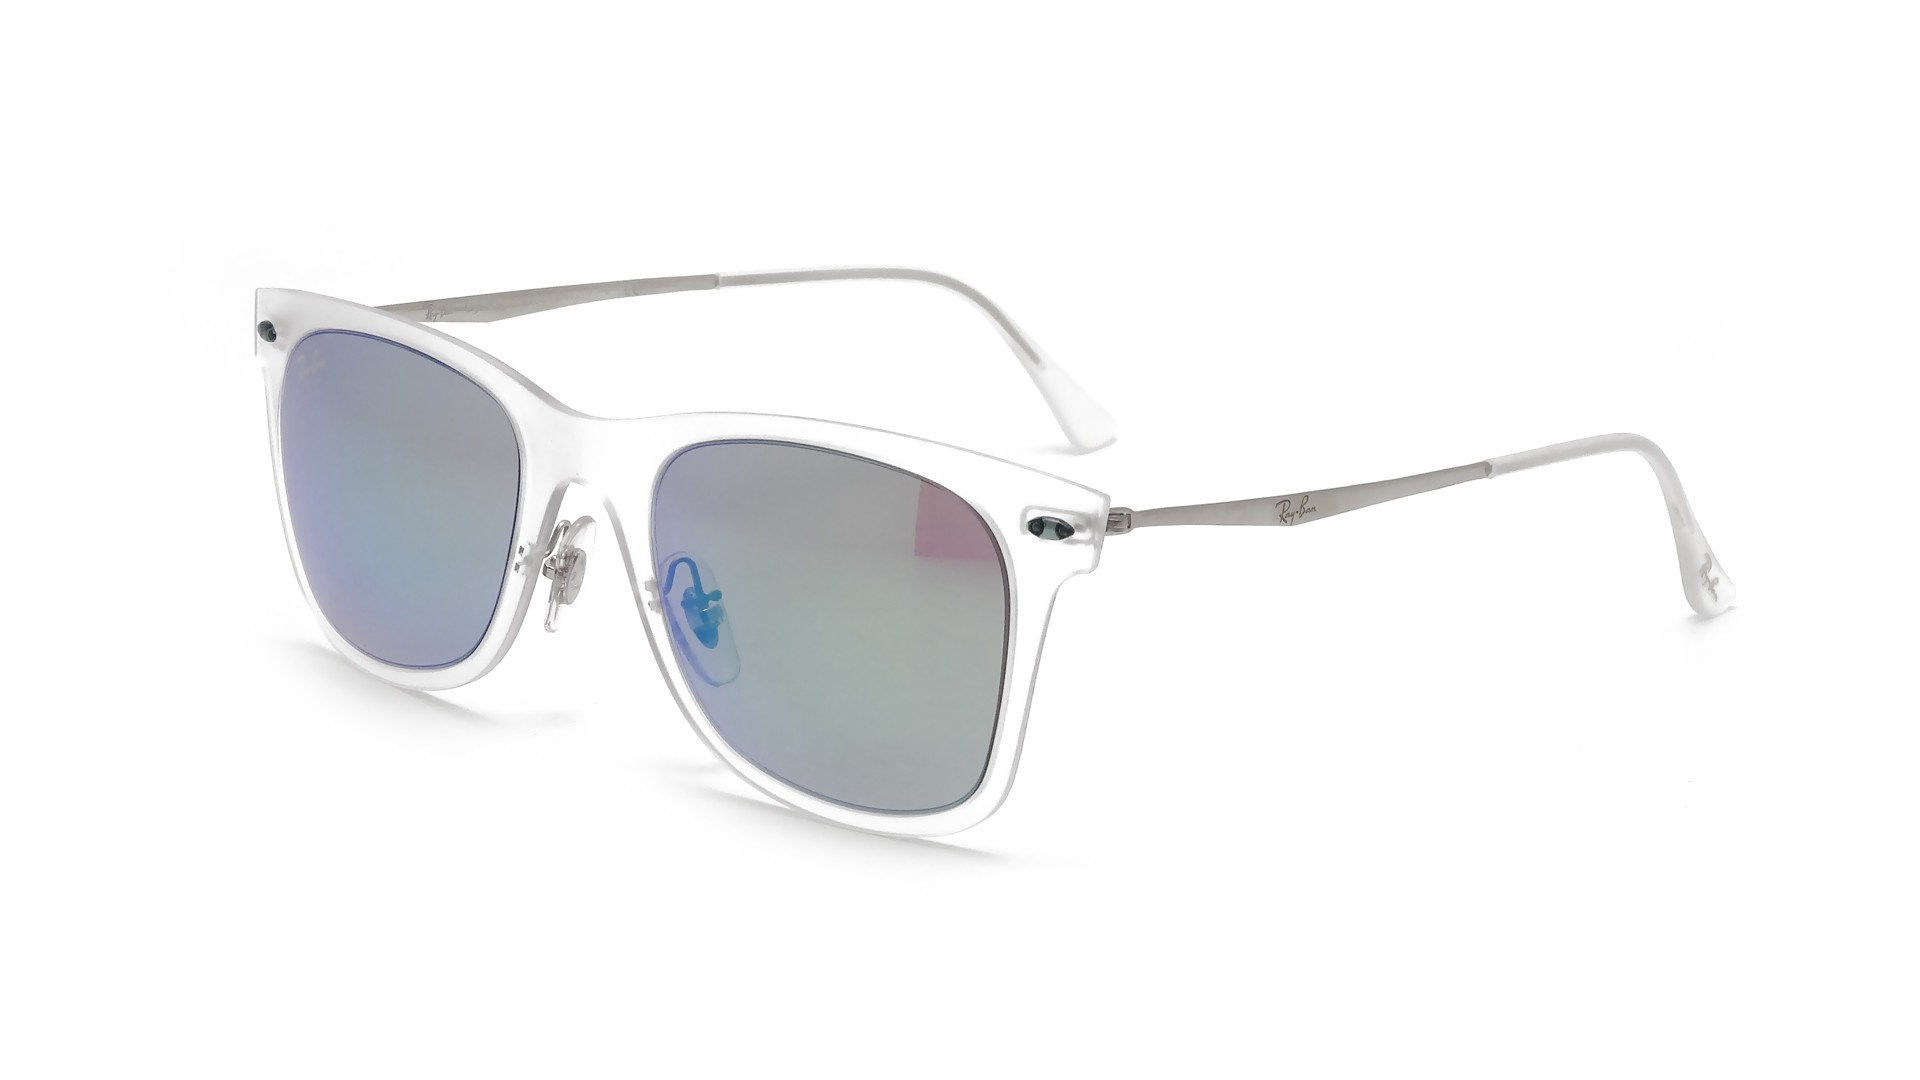 9007a27b19b Ray-ban Wayfarer Ii Sunglasses Clear   Black